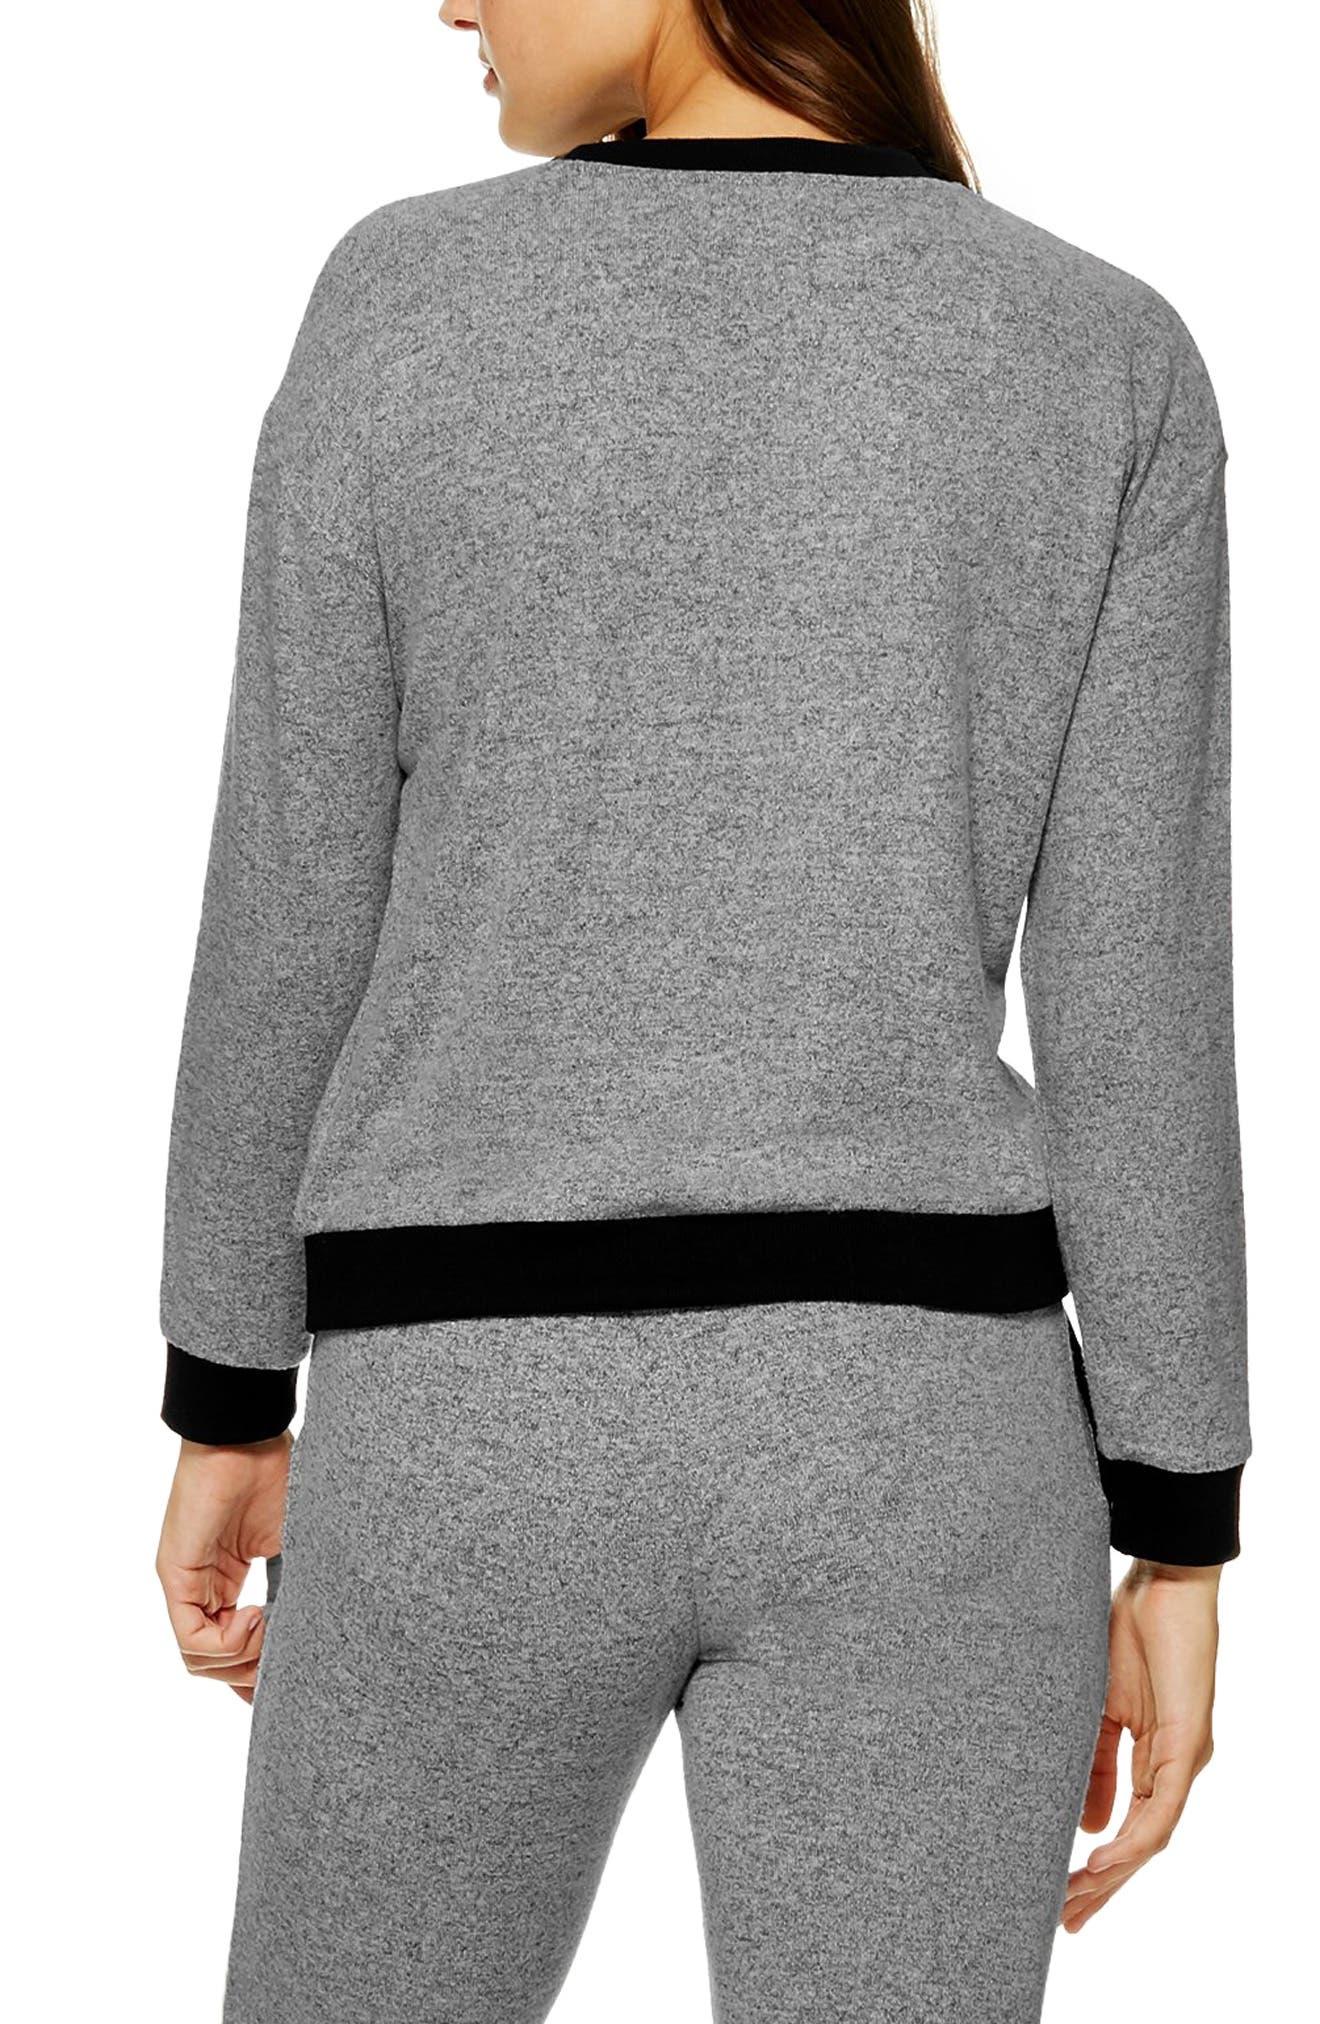 Supersoft Sweatshirt,                         Main,                         color, GREY MARL